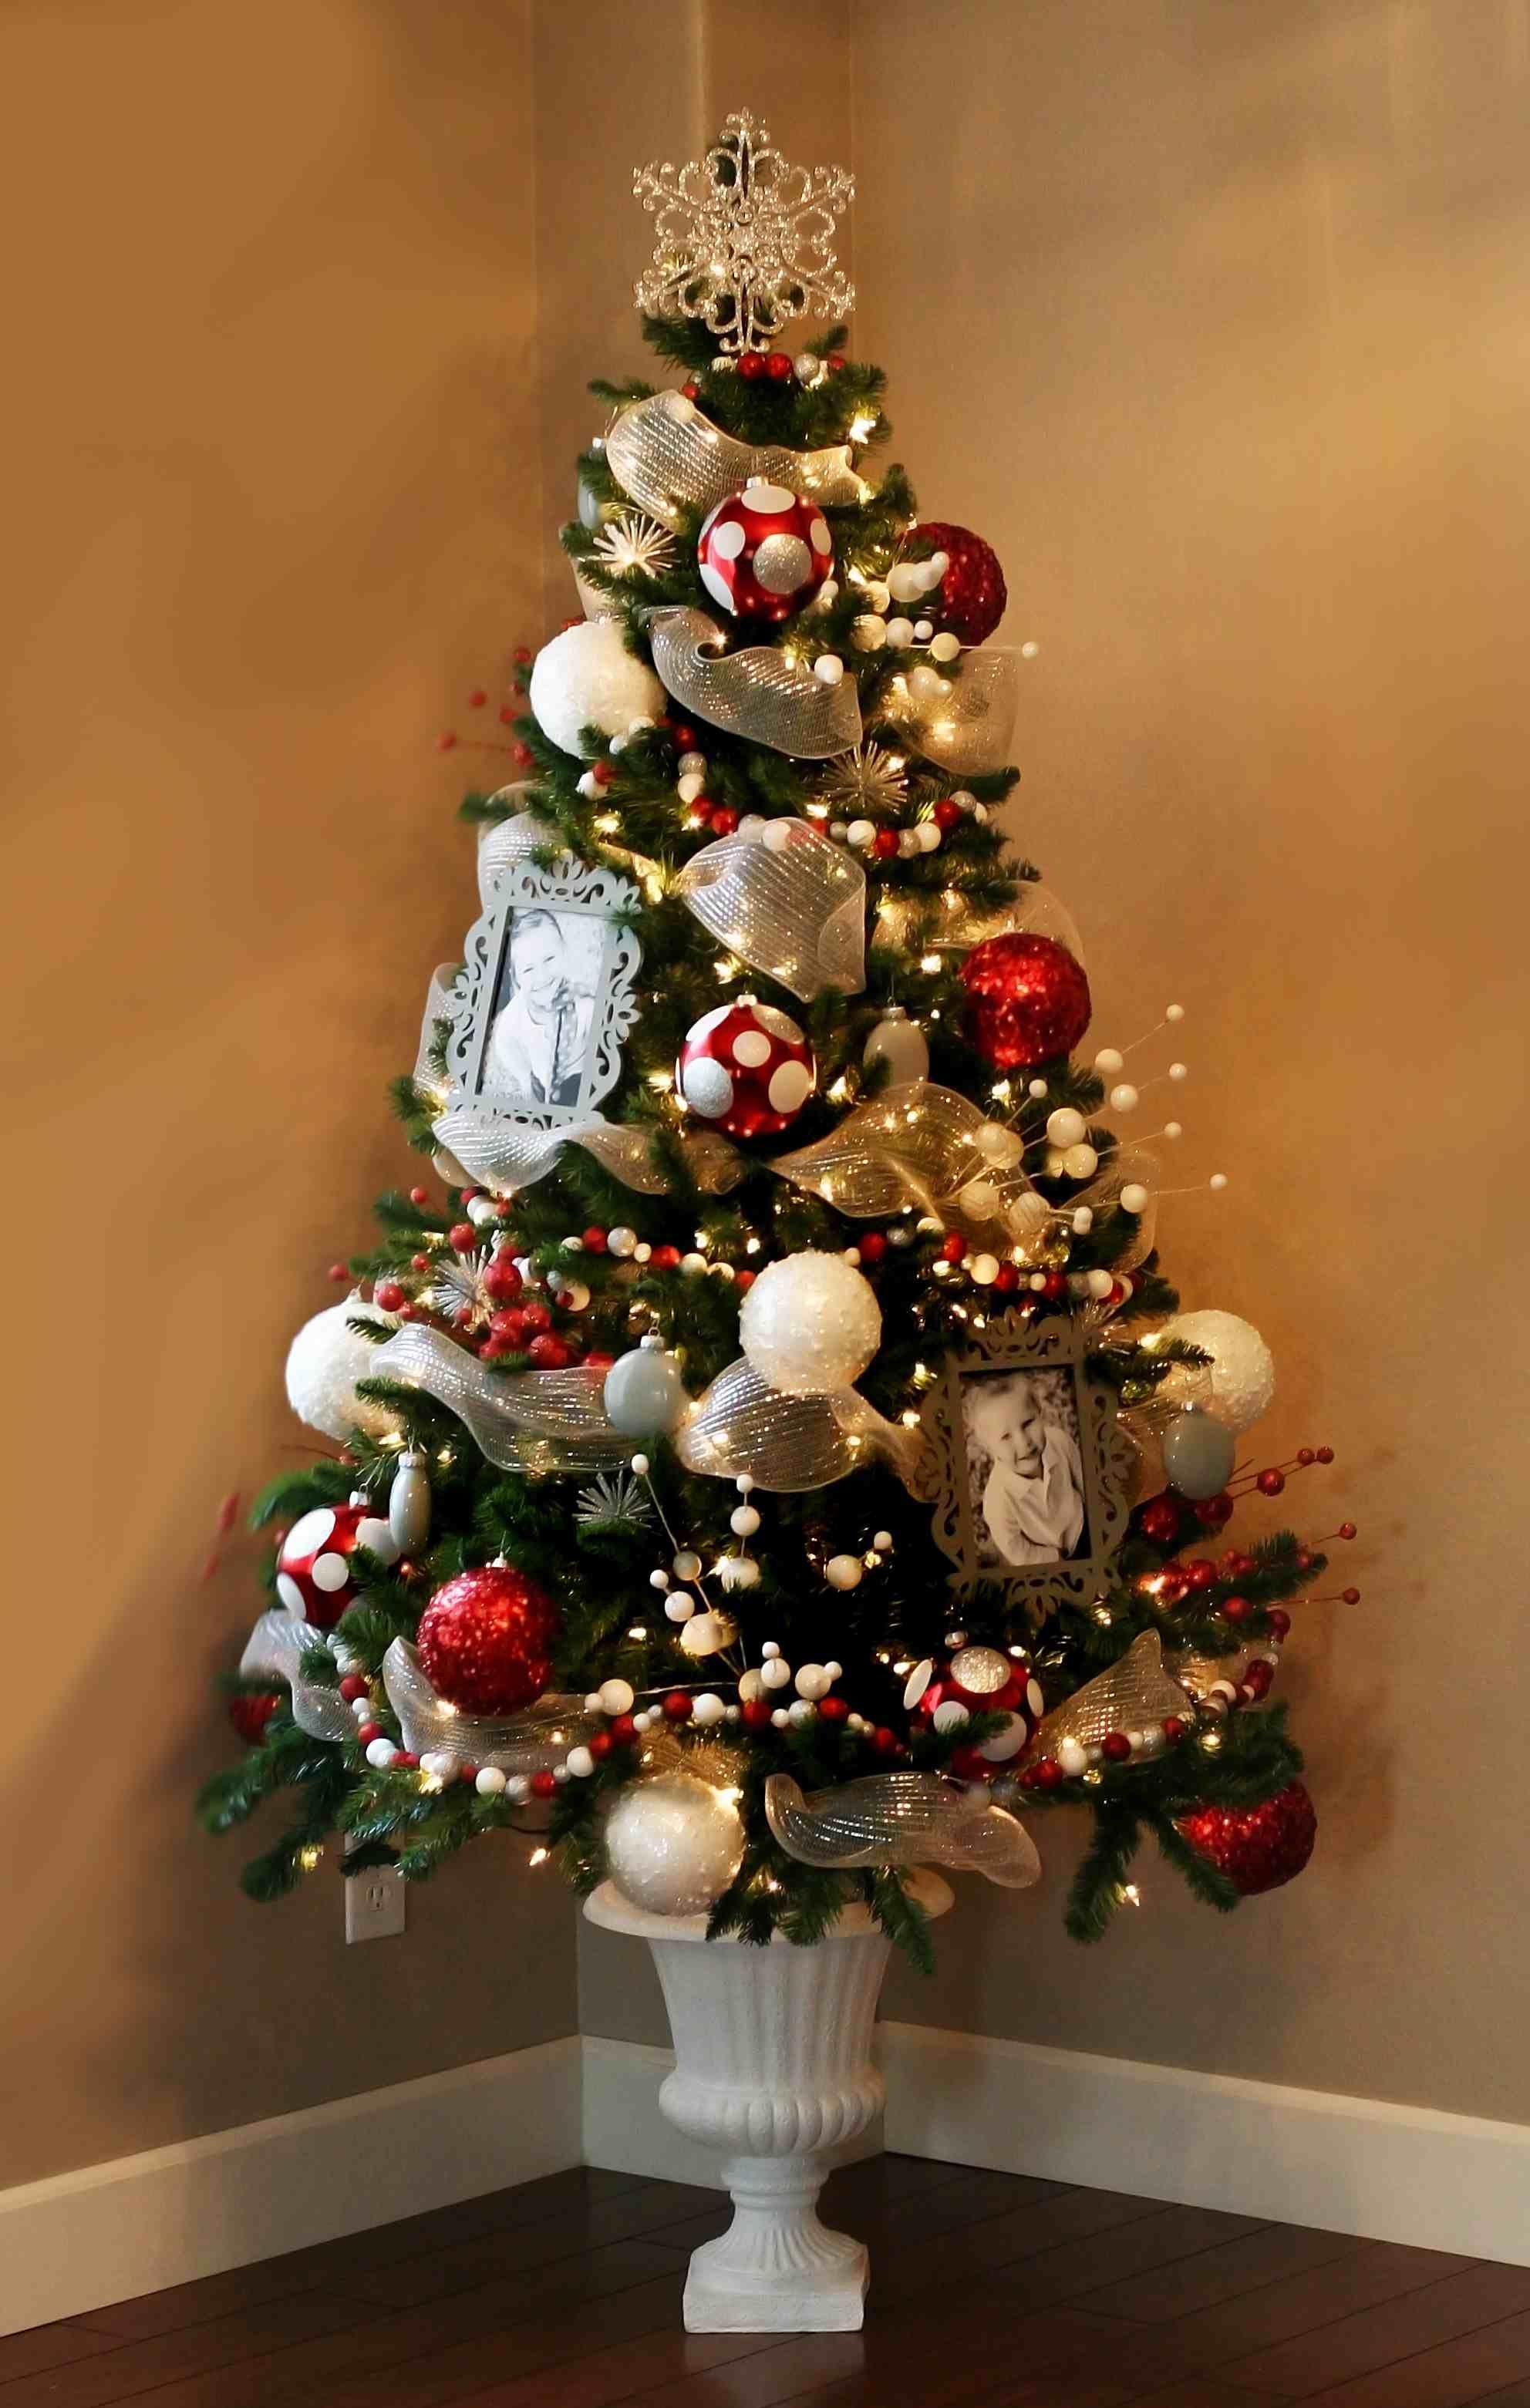 MichaelsStores Dream Tree Challenge by eighteen25